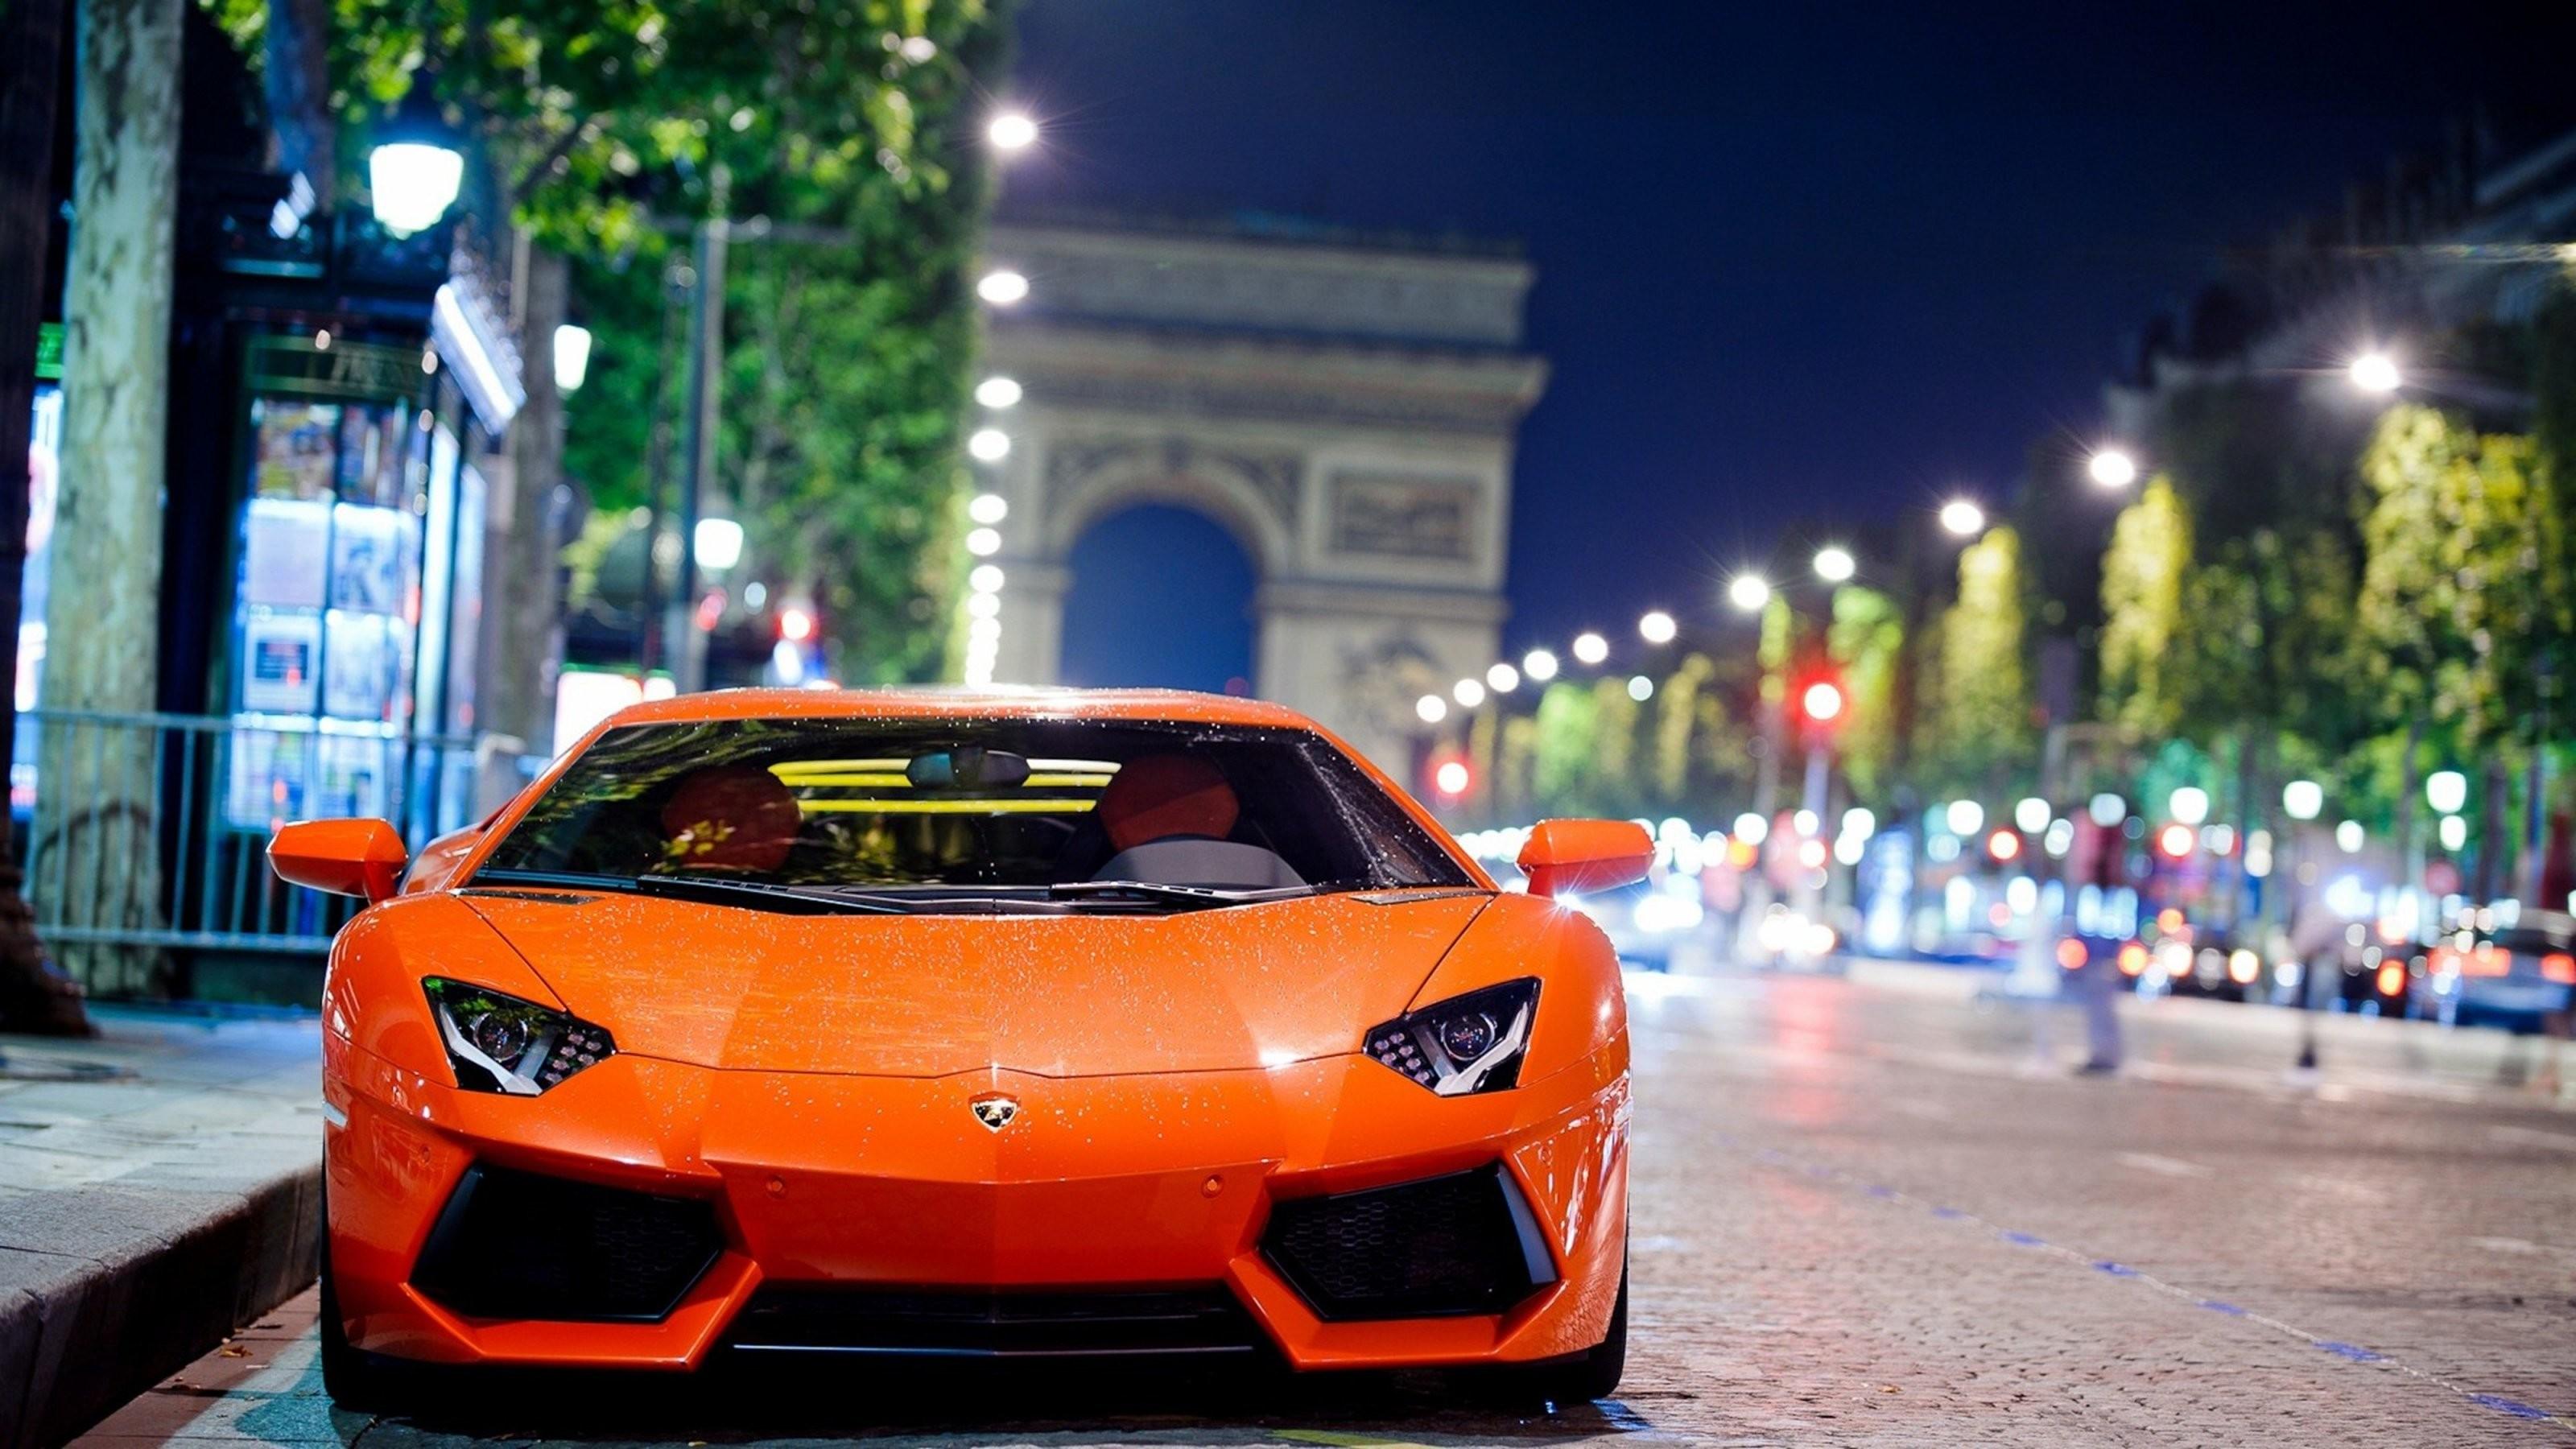 Res: 3200x1800, Night Photography Of Lamborghini Aventador In Paris Wallpaper